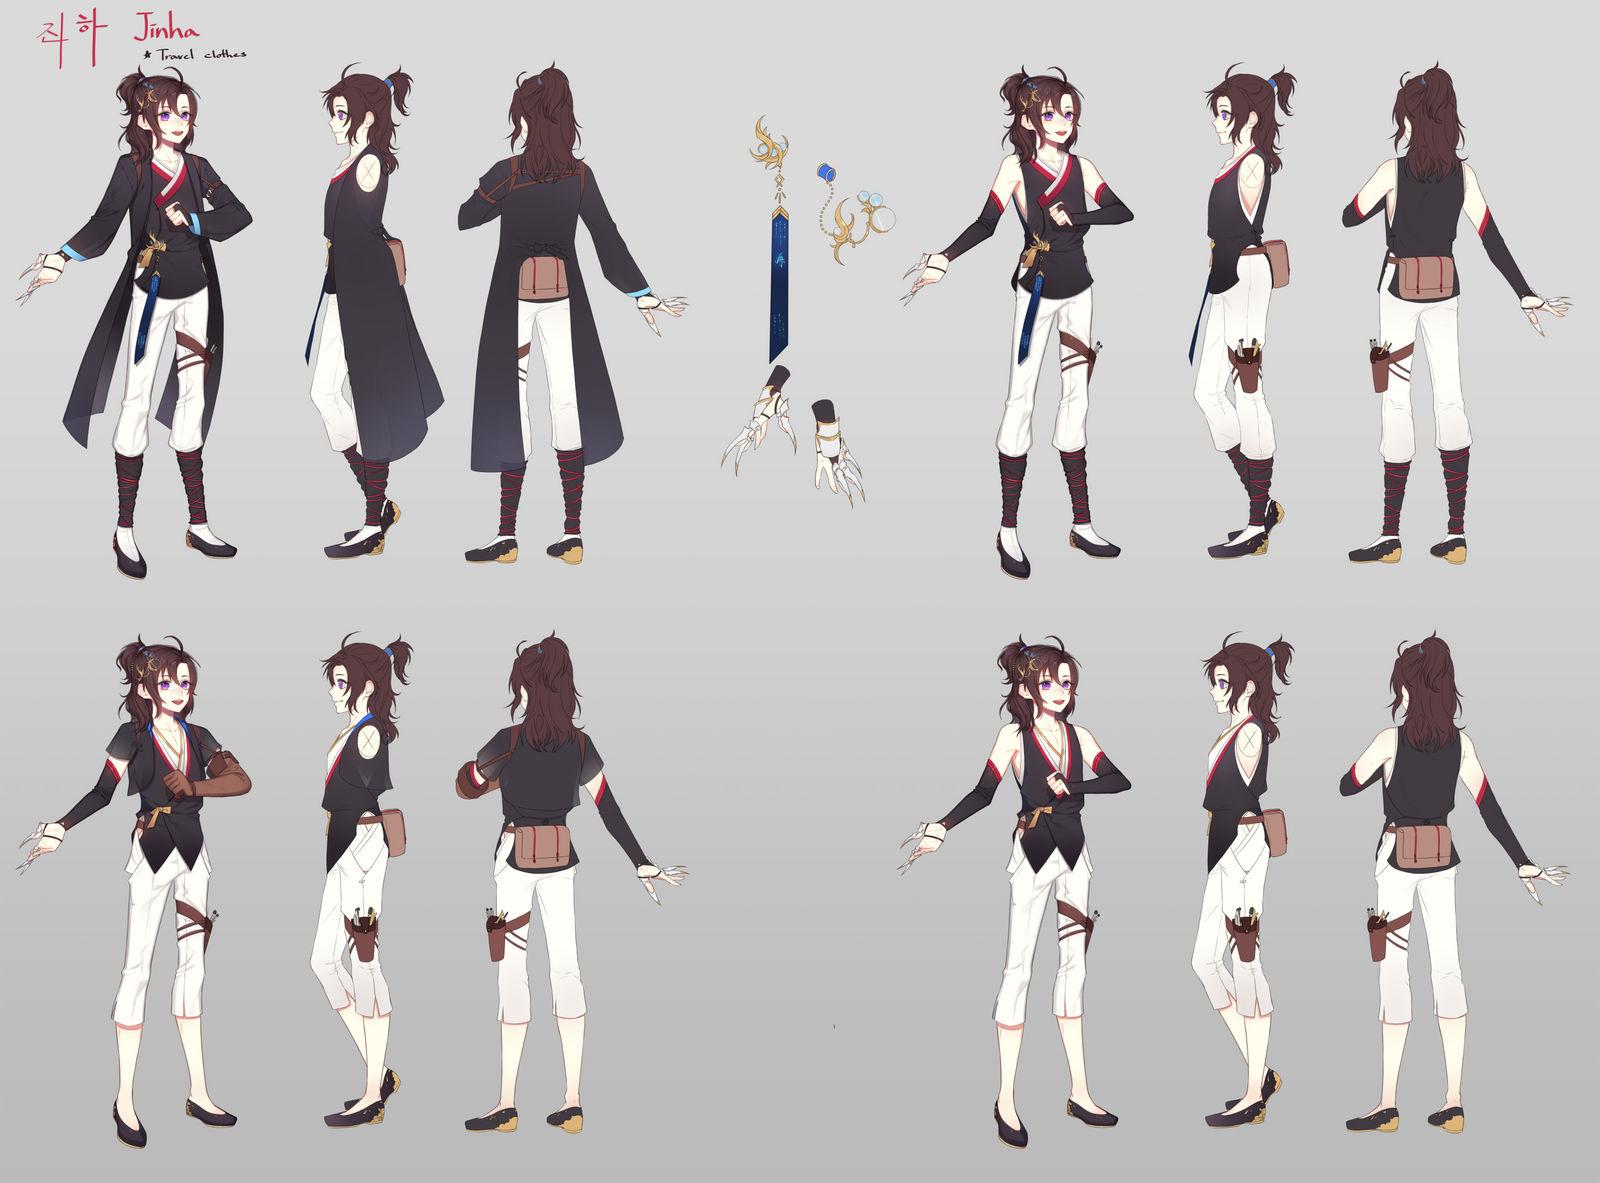 Jinha -  Time traveler by tokkiria